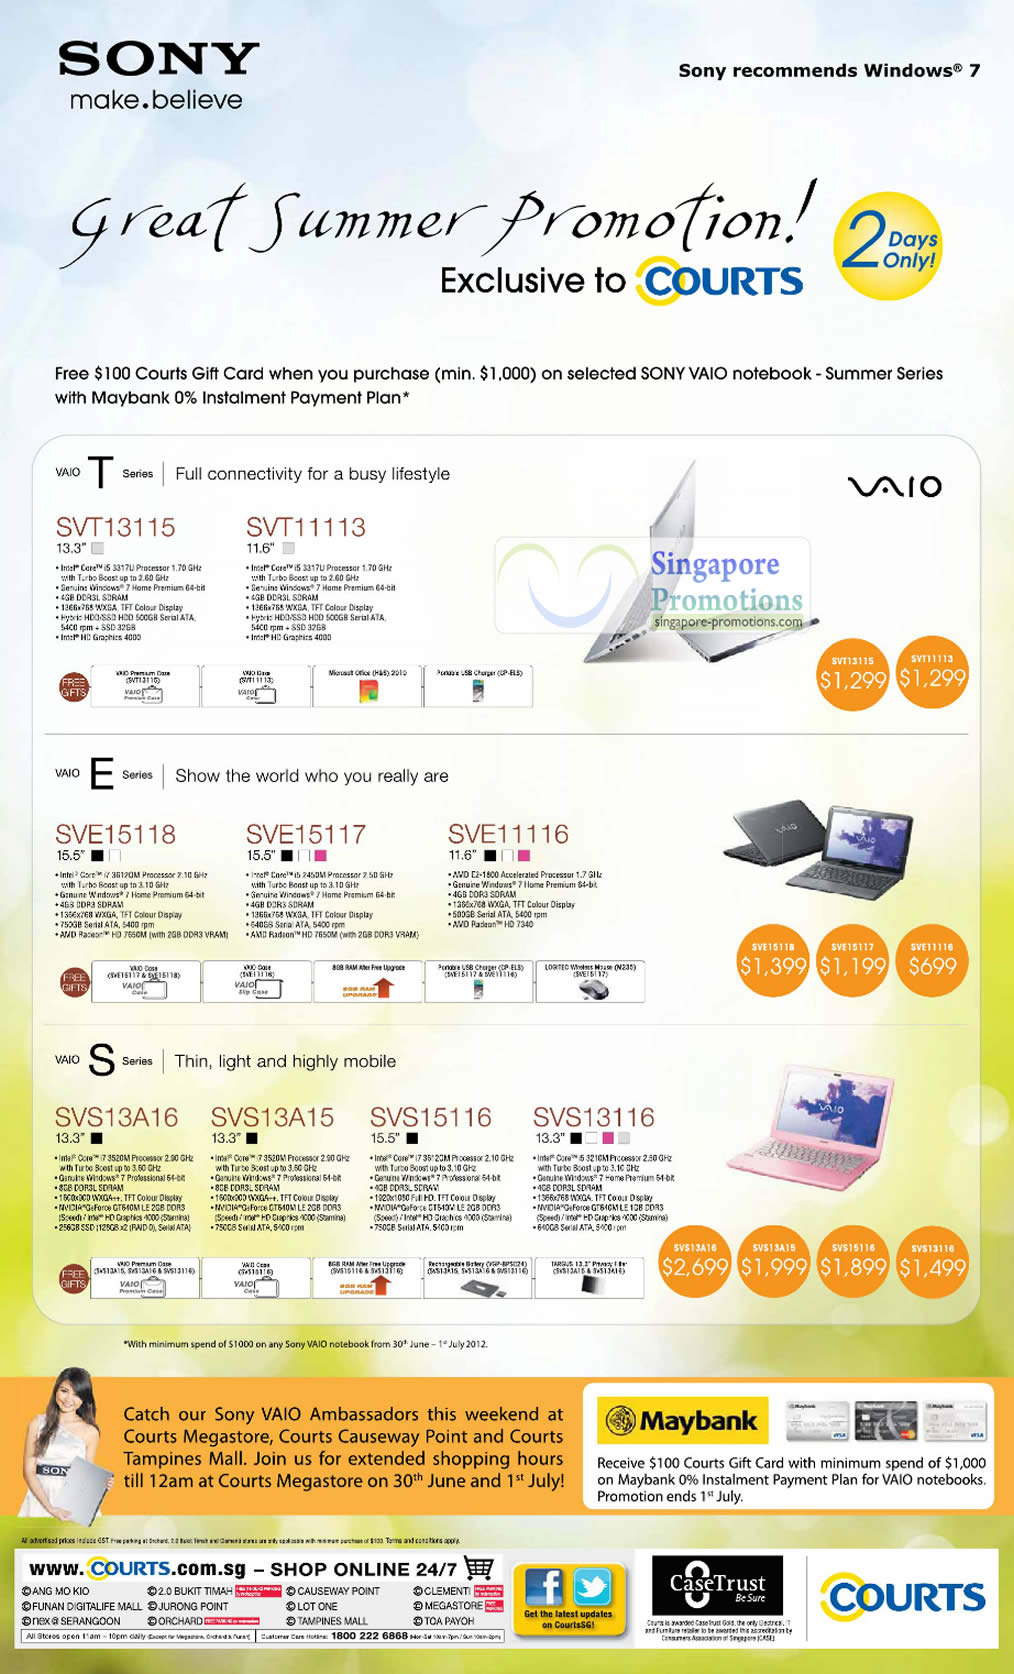 Sony Vaio Notebooks SVT13115, SVT11113, SVE15118, SVE15117, SVE11116, SVS13A16, SVS13A15, SVS15116, SVS13116